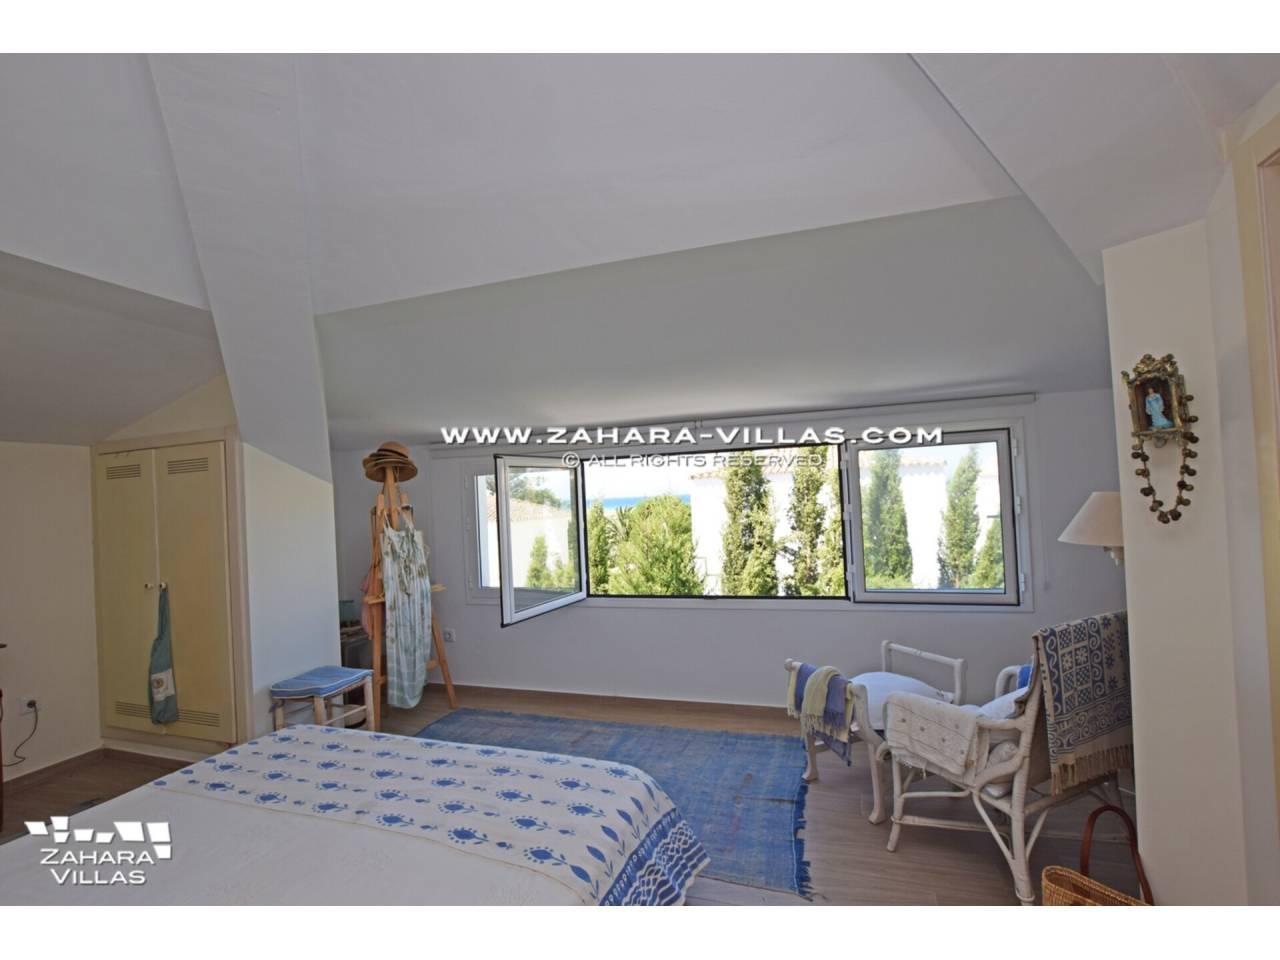 Imagen 36 de House for sale close to the beach, with sea views in Zahara de los Atunes